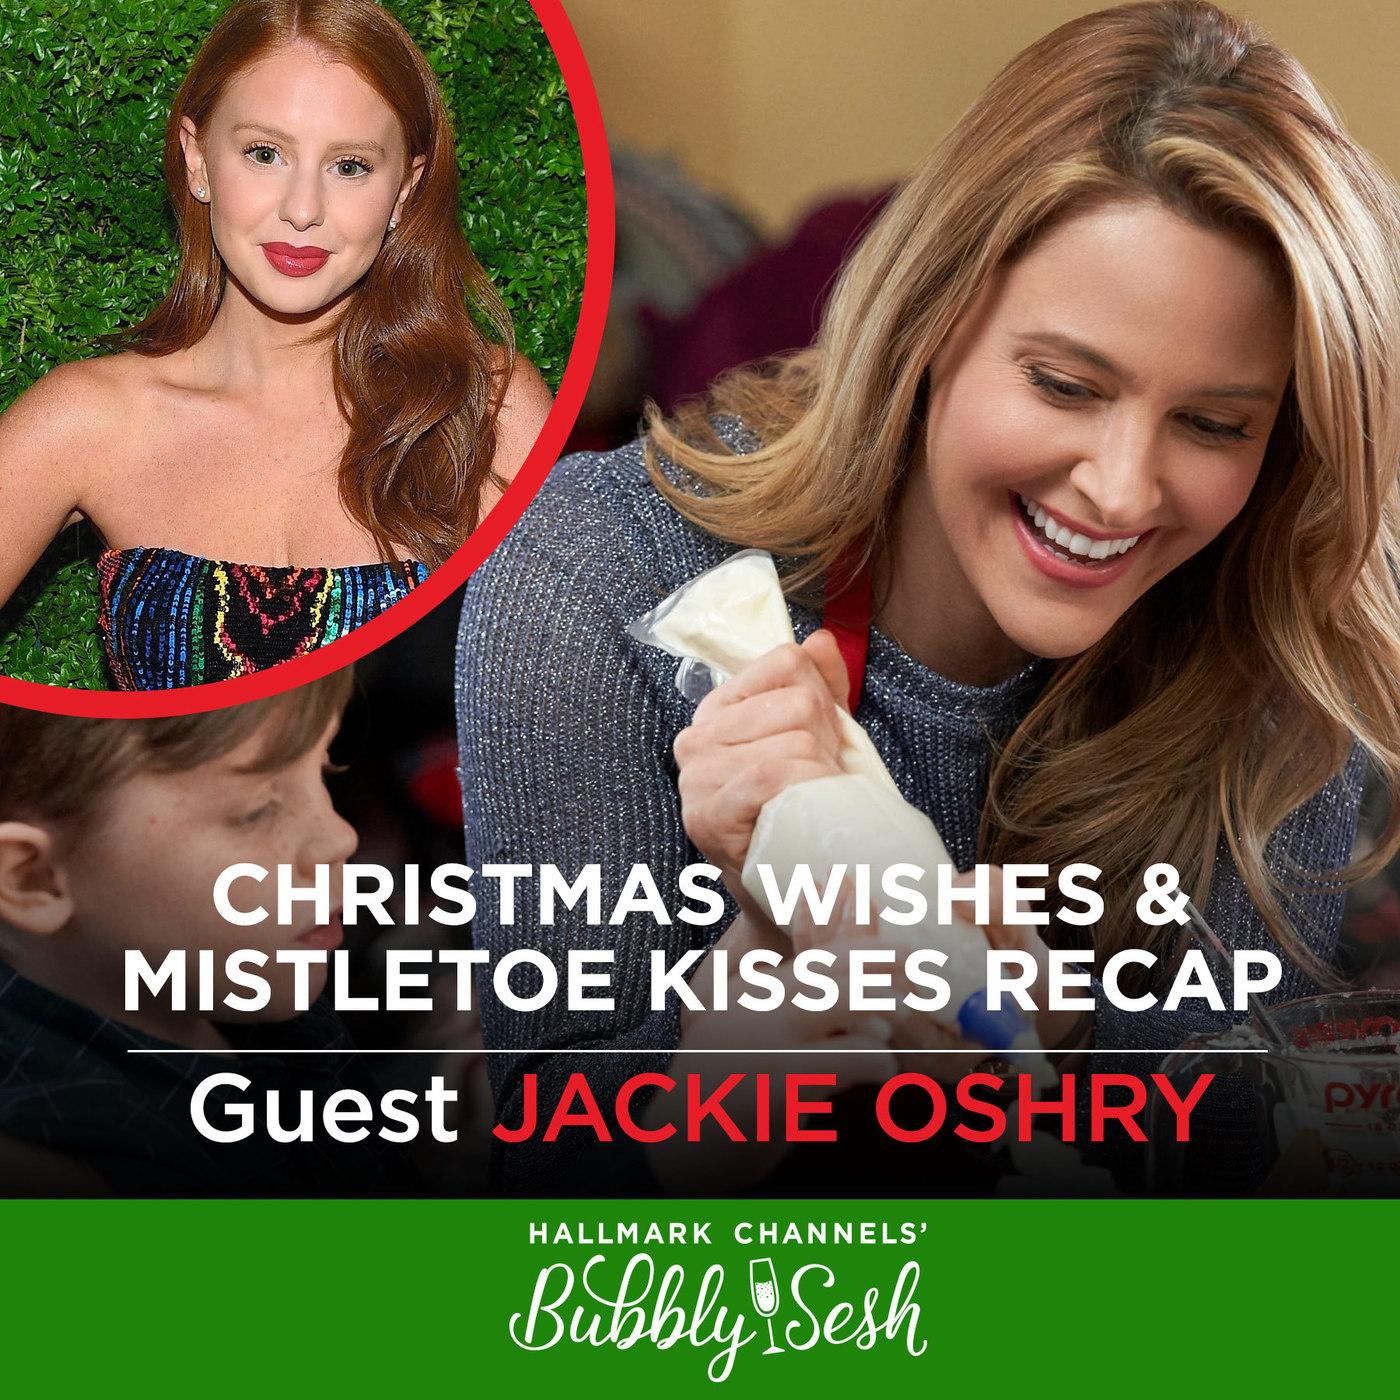 Christmas Wishes & Mistletoe Kisses Recap with Jackie Oshry